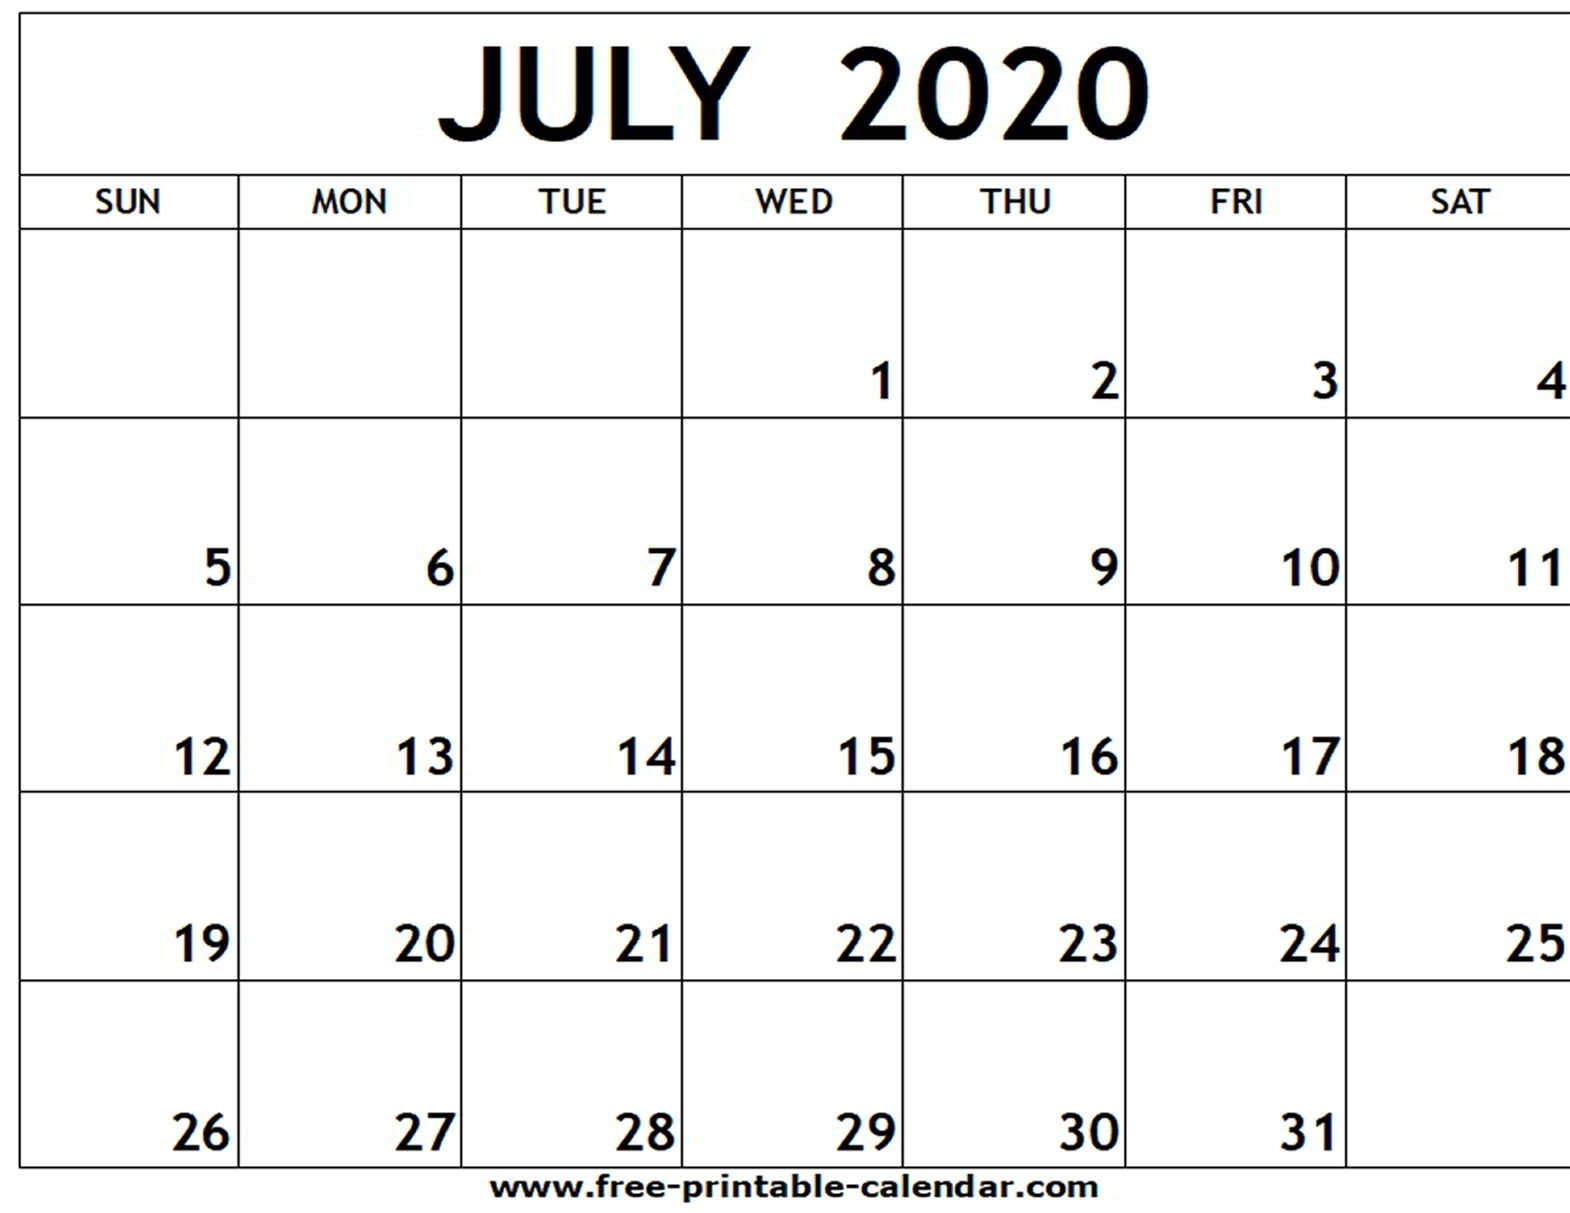 July 2020 Printable Calendar - Free-Printable-Calendar-June August 2020 Calendar Template